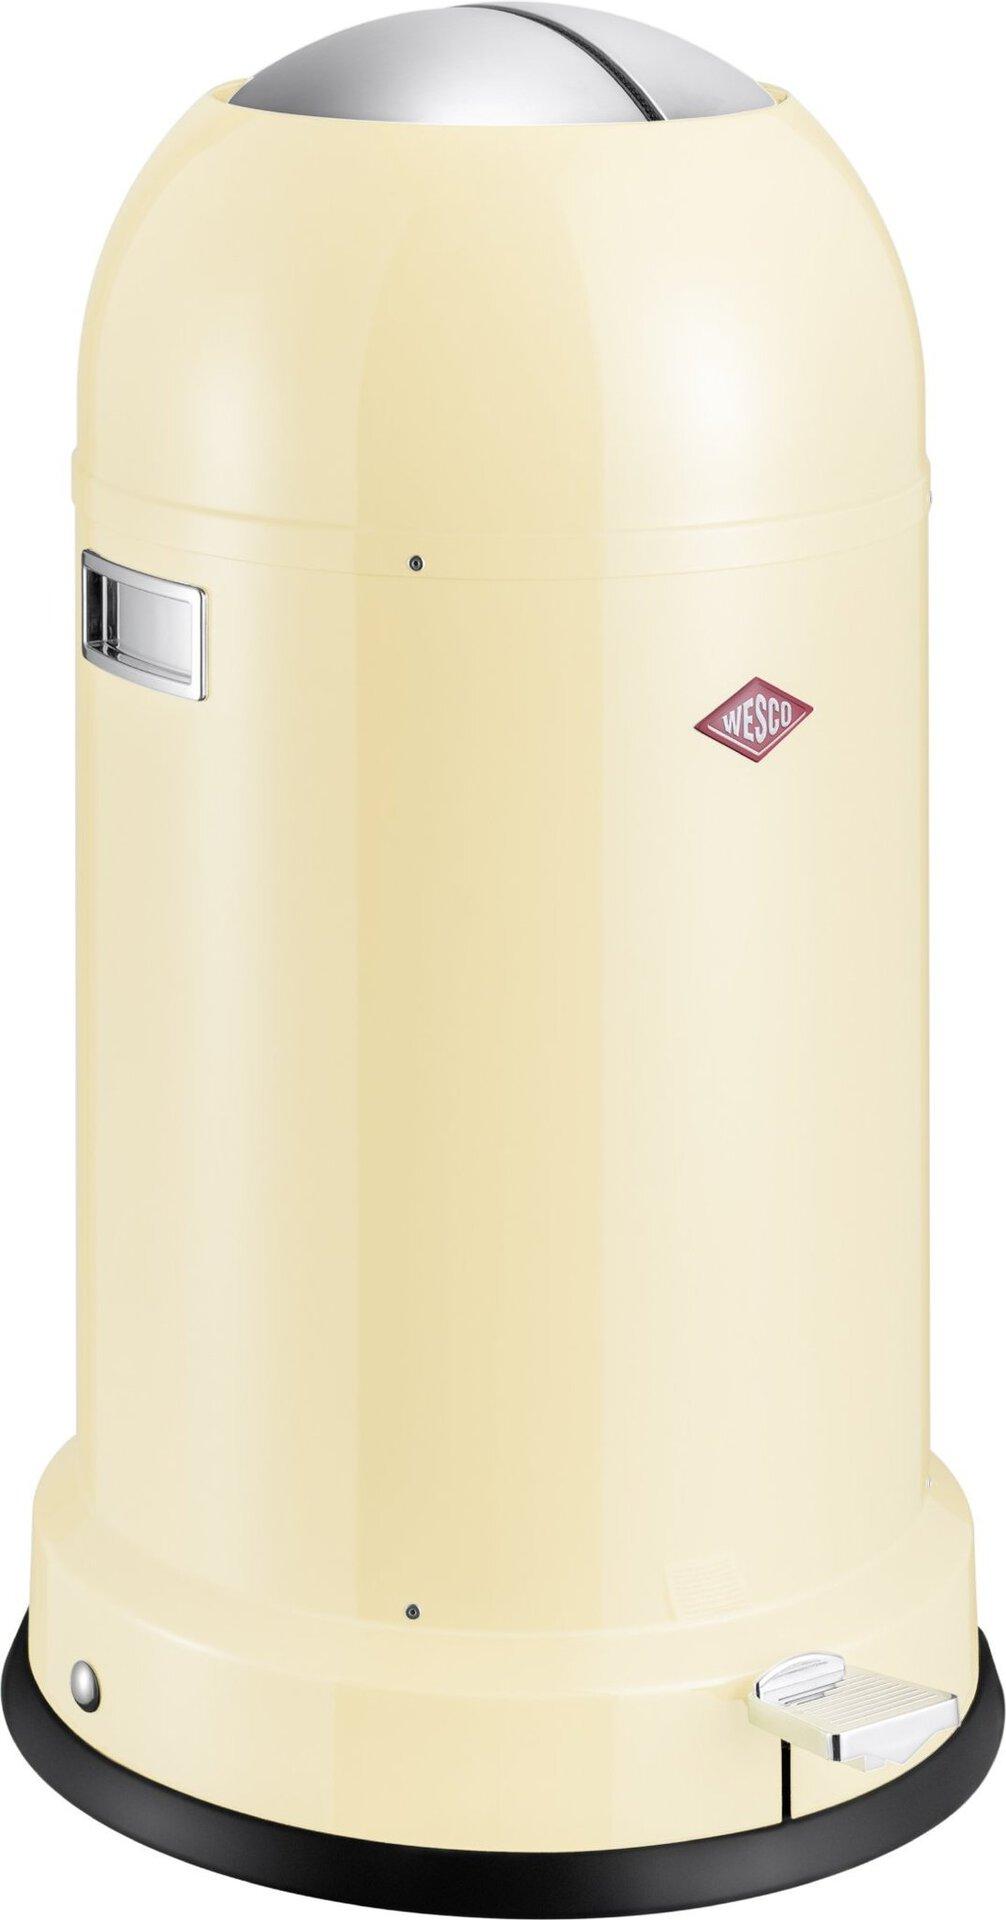 Müllbehälter Kickmaster CL Wesco Metall 41 x 1 x 41 cm